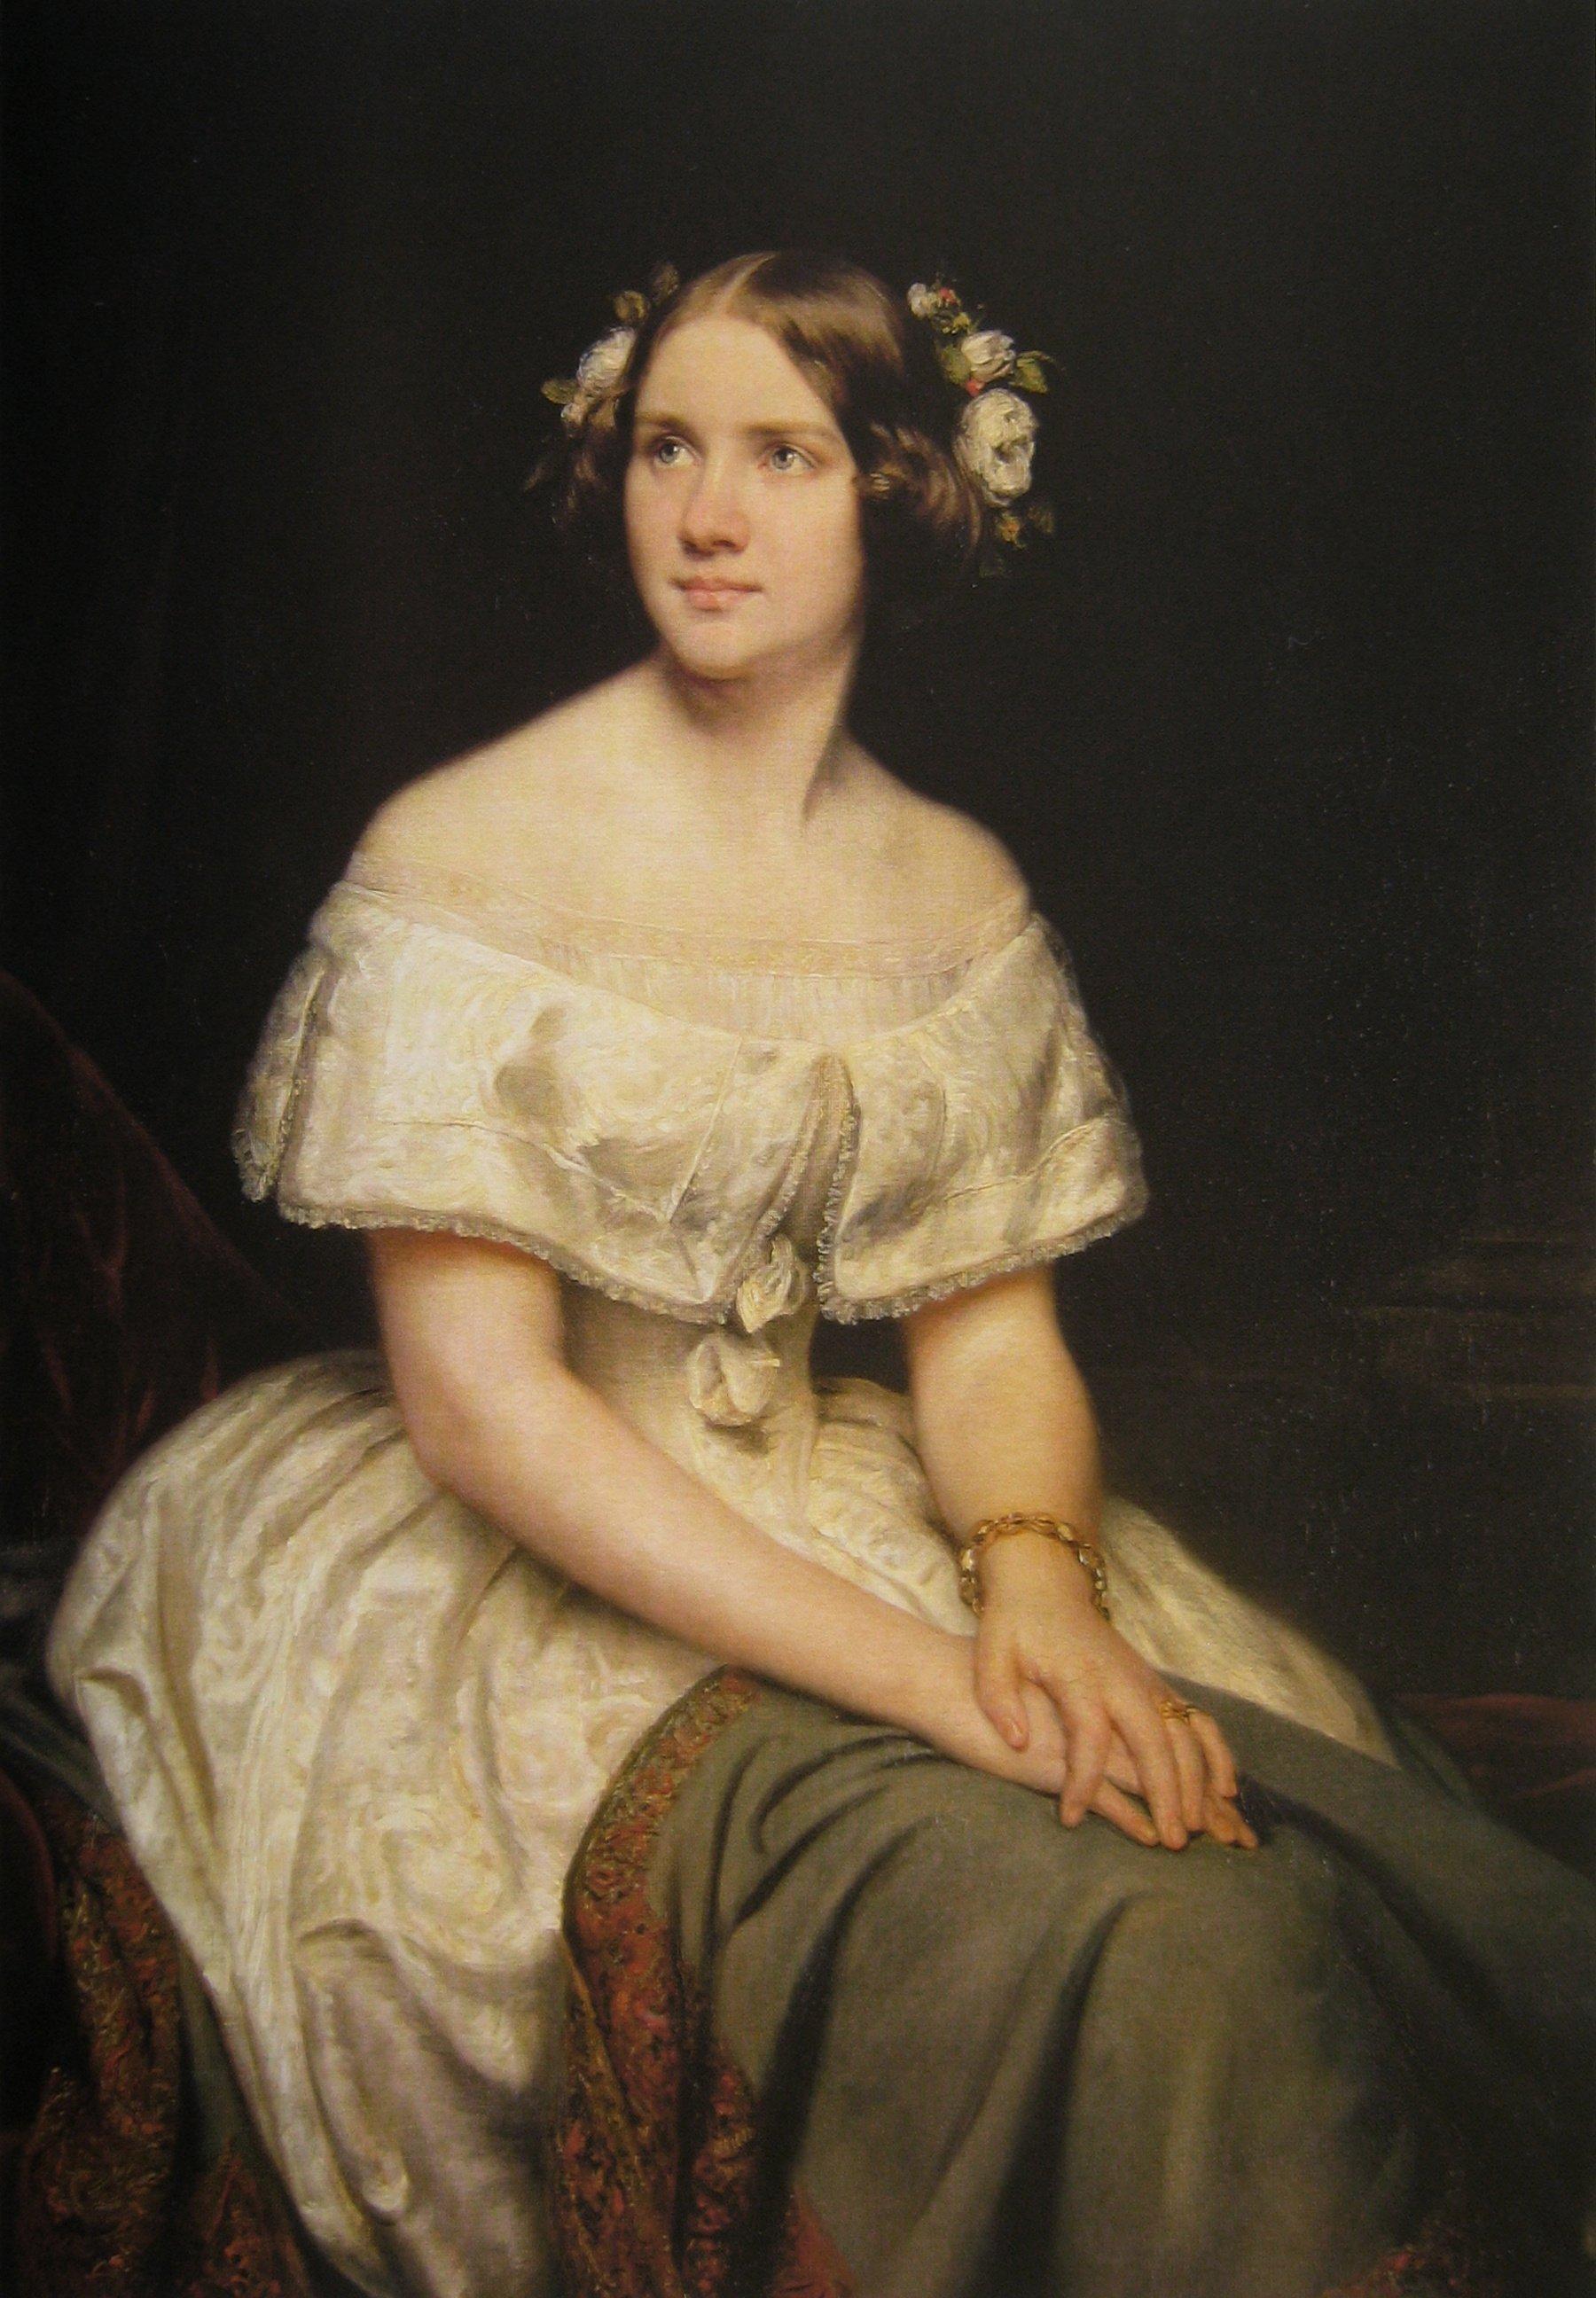 Portrait of Jenny Lind by Eduard Magnus (1862)